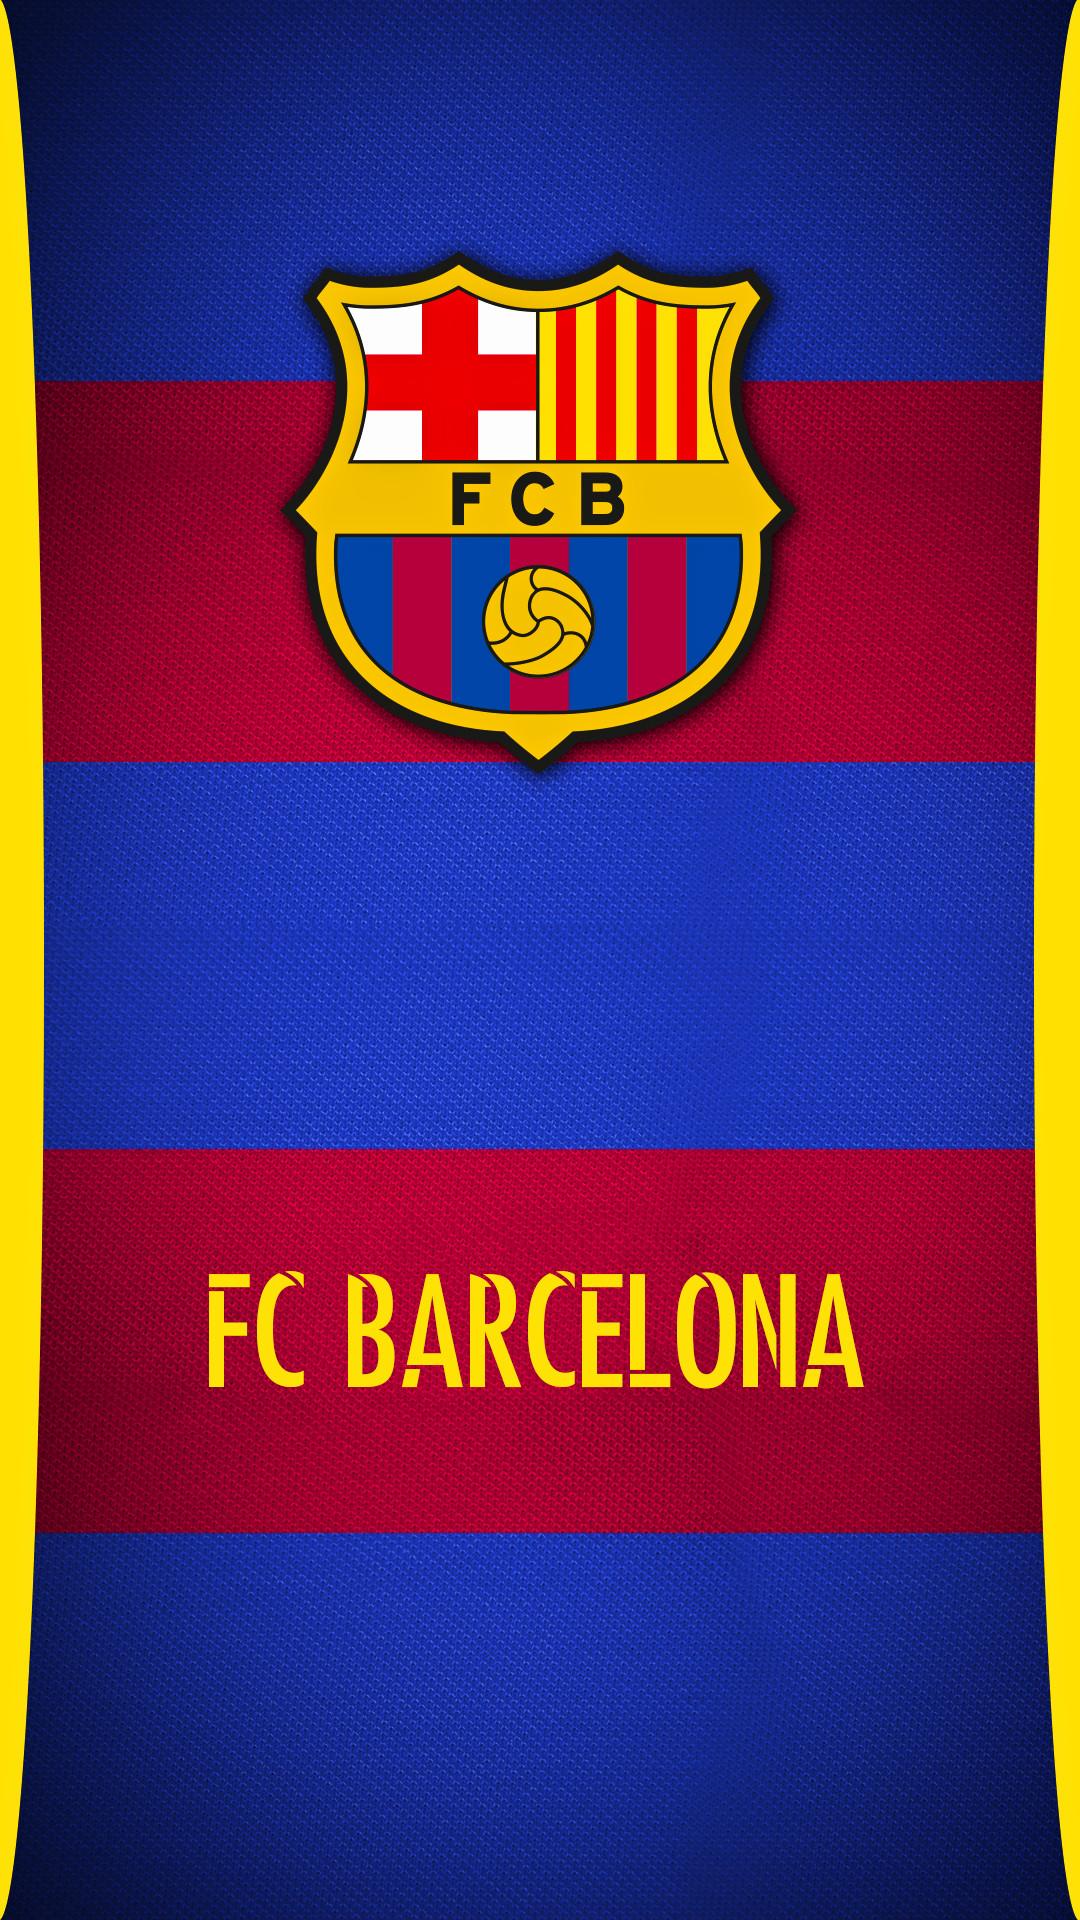 FC Barcelona SMARTPHONE wallpaper HD by SelvedinFCB FC Barcelona SMARTPHONE wallpaper  HD by SelvedinFCB